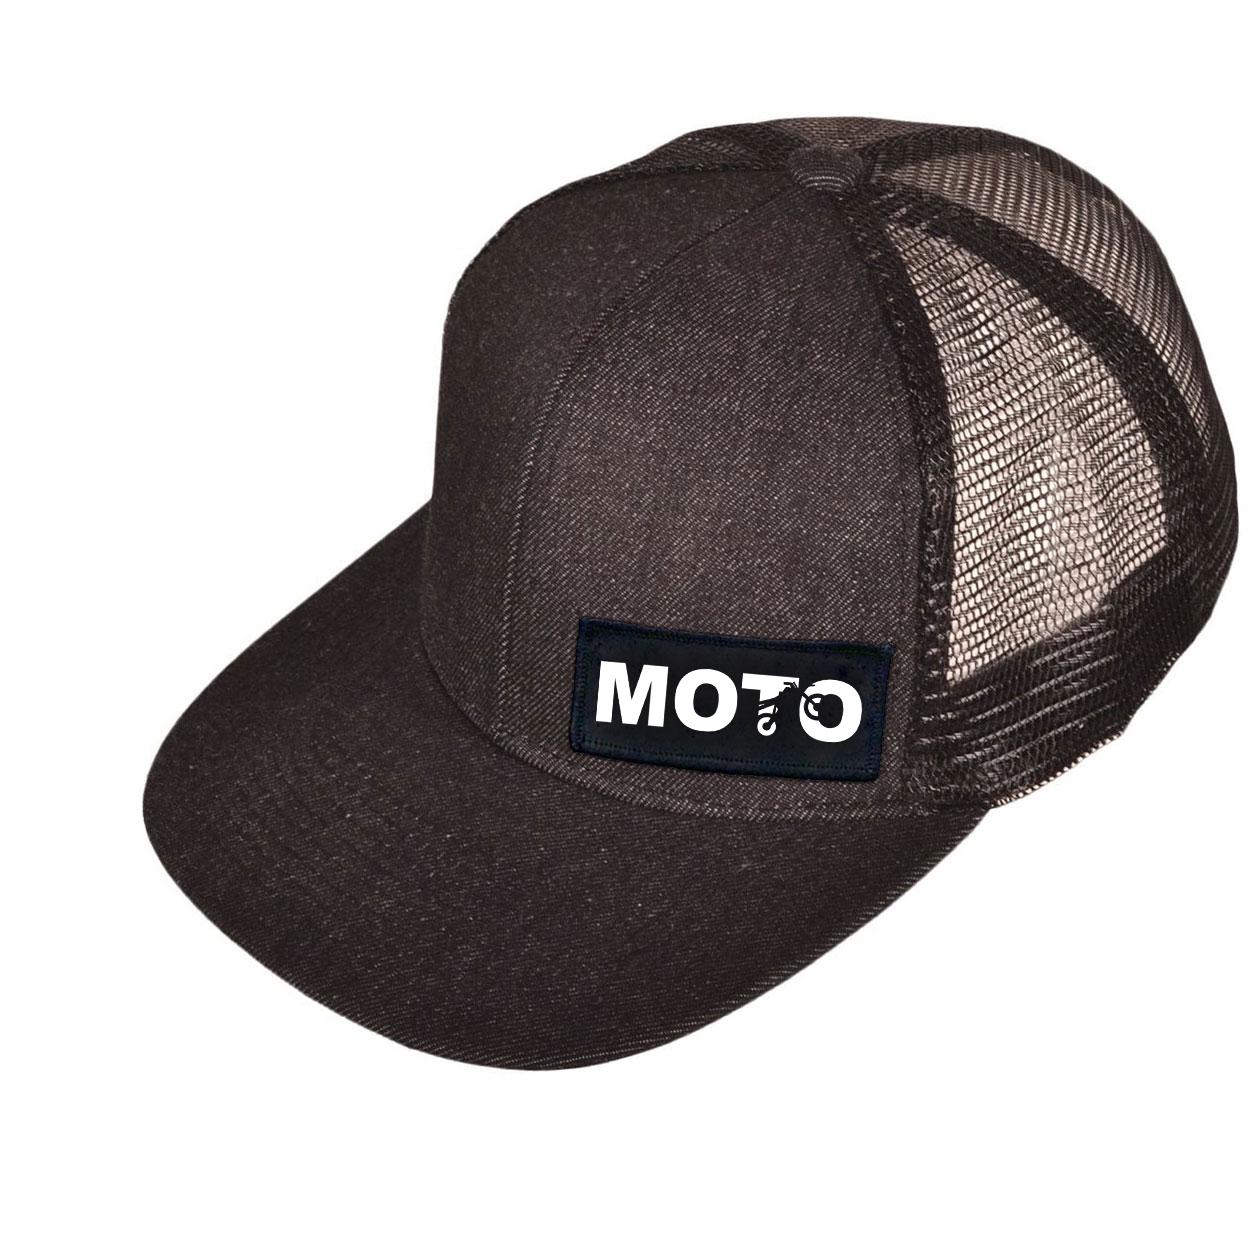 Moto Wheelie Logo Night Out Woven Patch Snapback Flat Brim Hat Black Denim (White Logo)